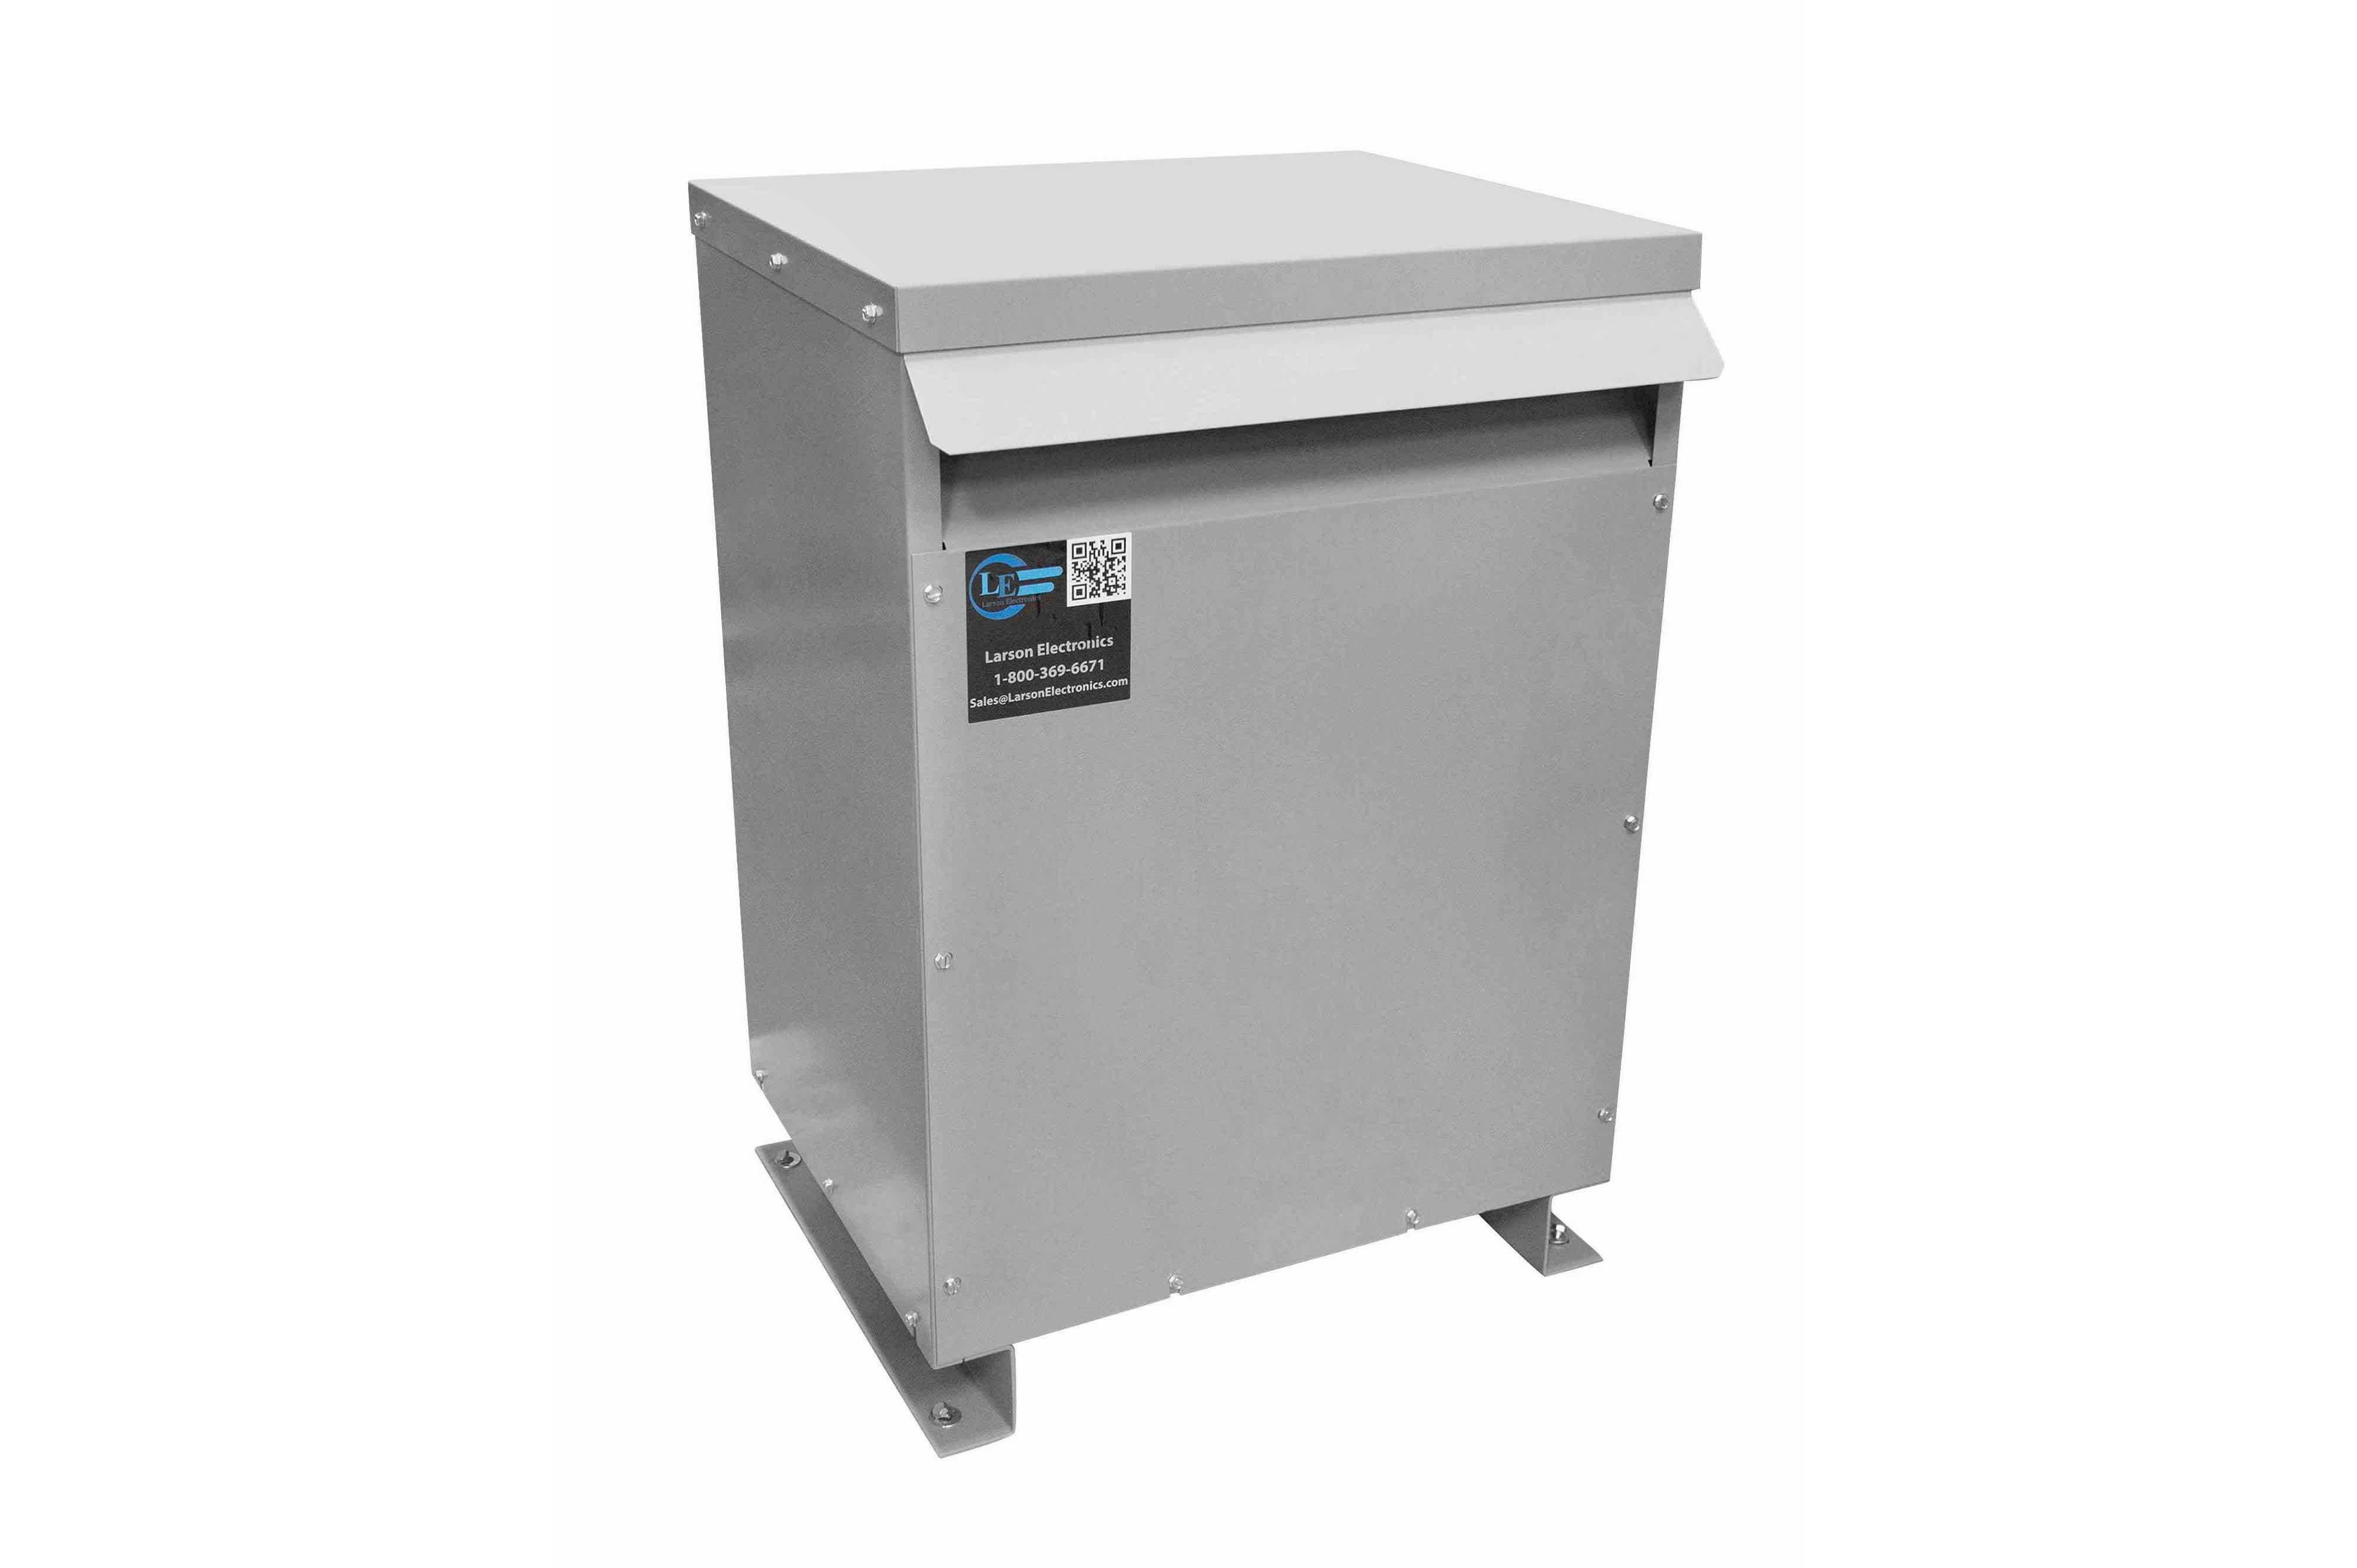 29 kVA 3PH Isolation Transformer, 440V Wye Primary, 208V Delta Secondary, N3R, Ventilated, 60 Hz